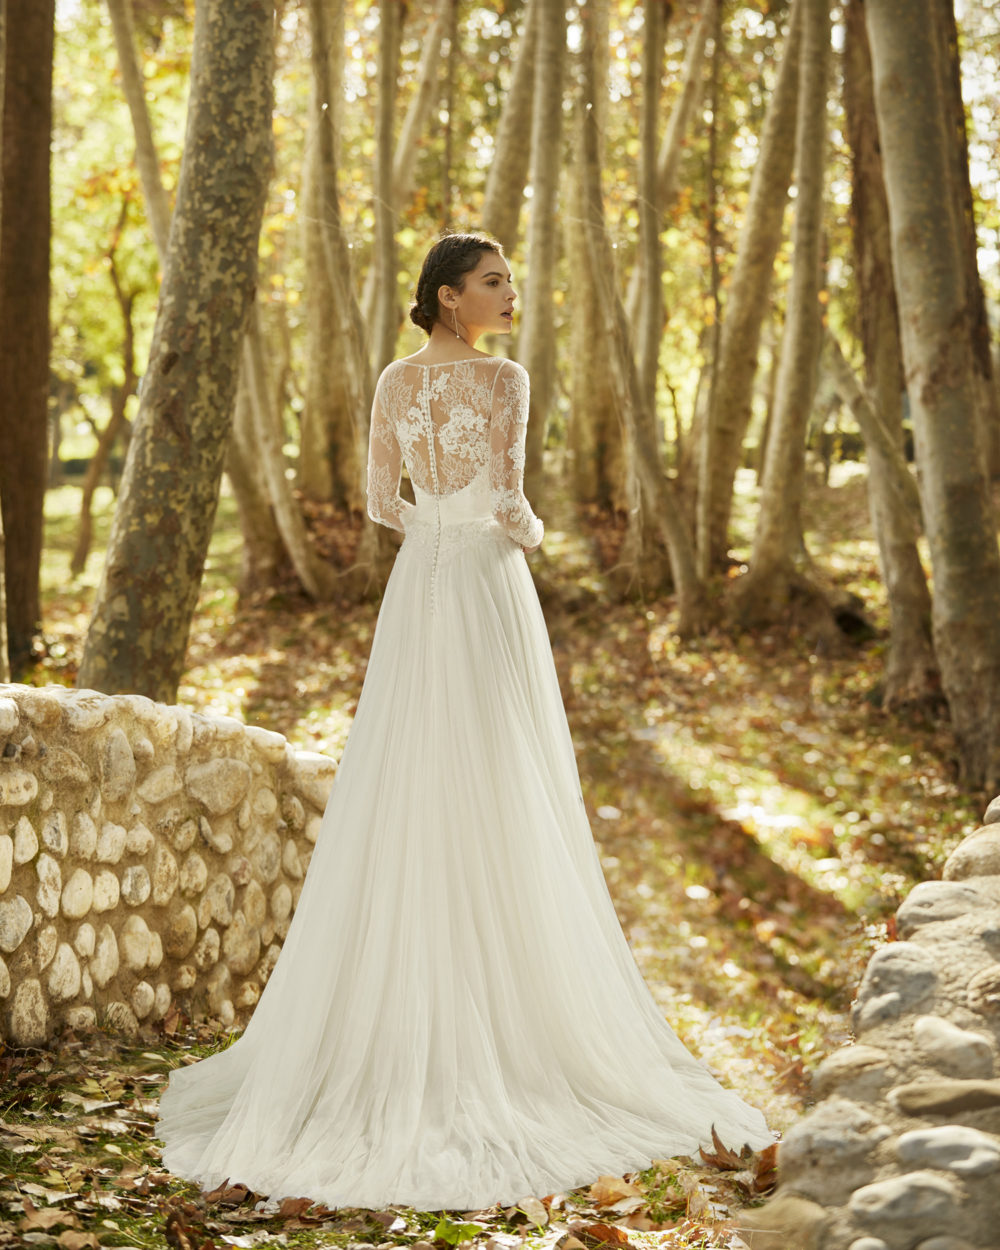 Mariages: abito da sposa Rosa Clarà 2020 a Vicenza, Verona, Padova, Veneto 4B163 OMEYA